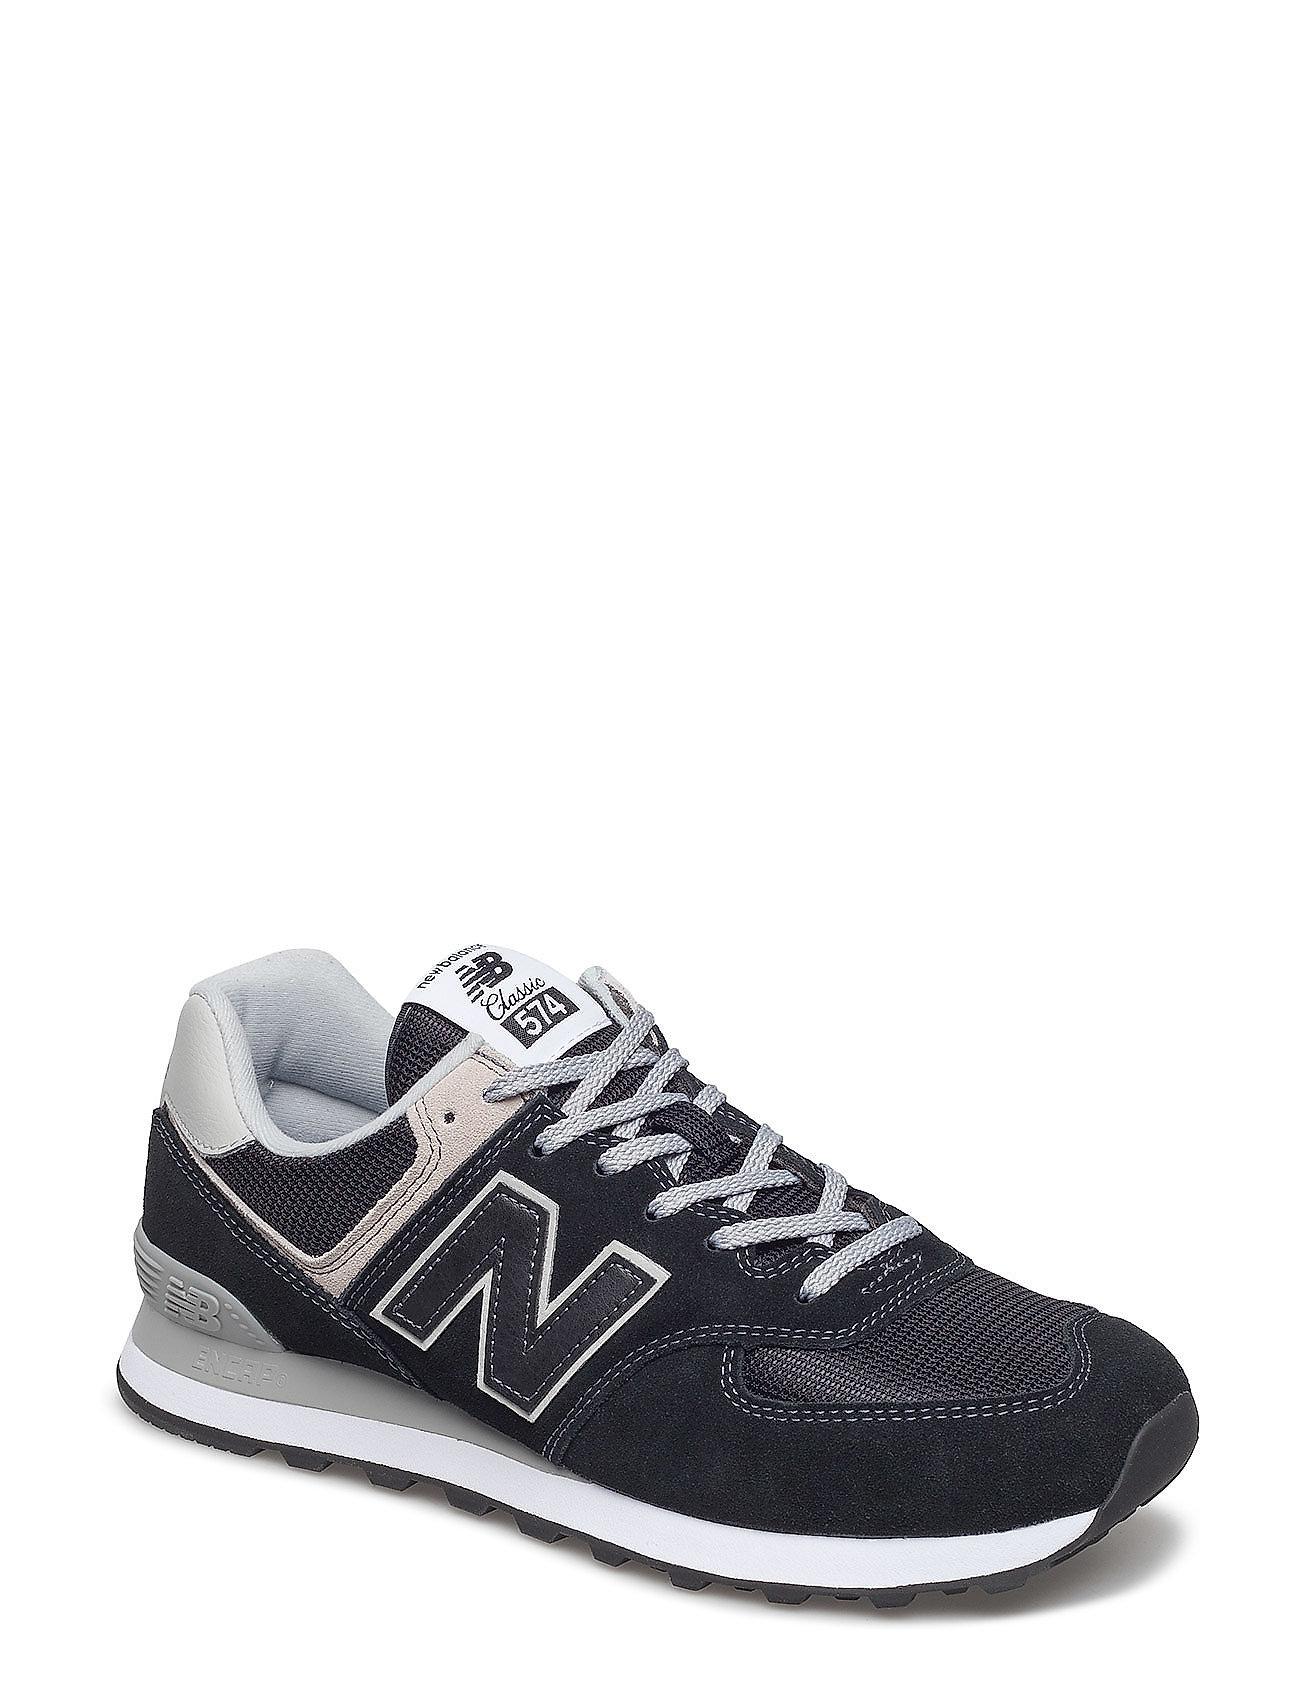 2555cc27a89 Ml574egk (Black) (£94) - New Balance -